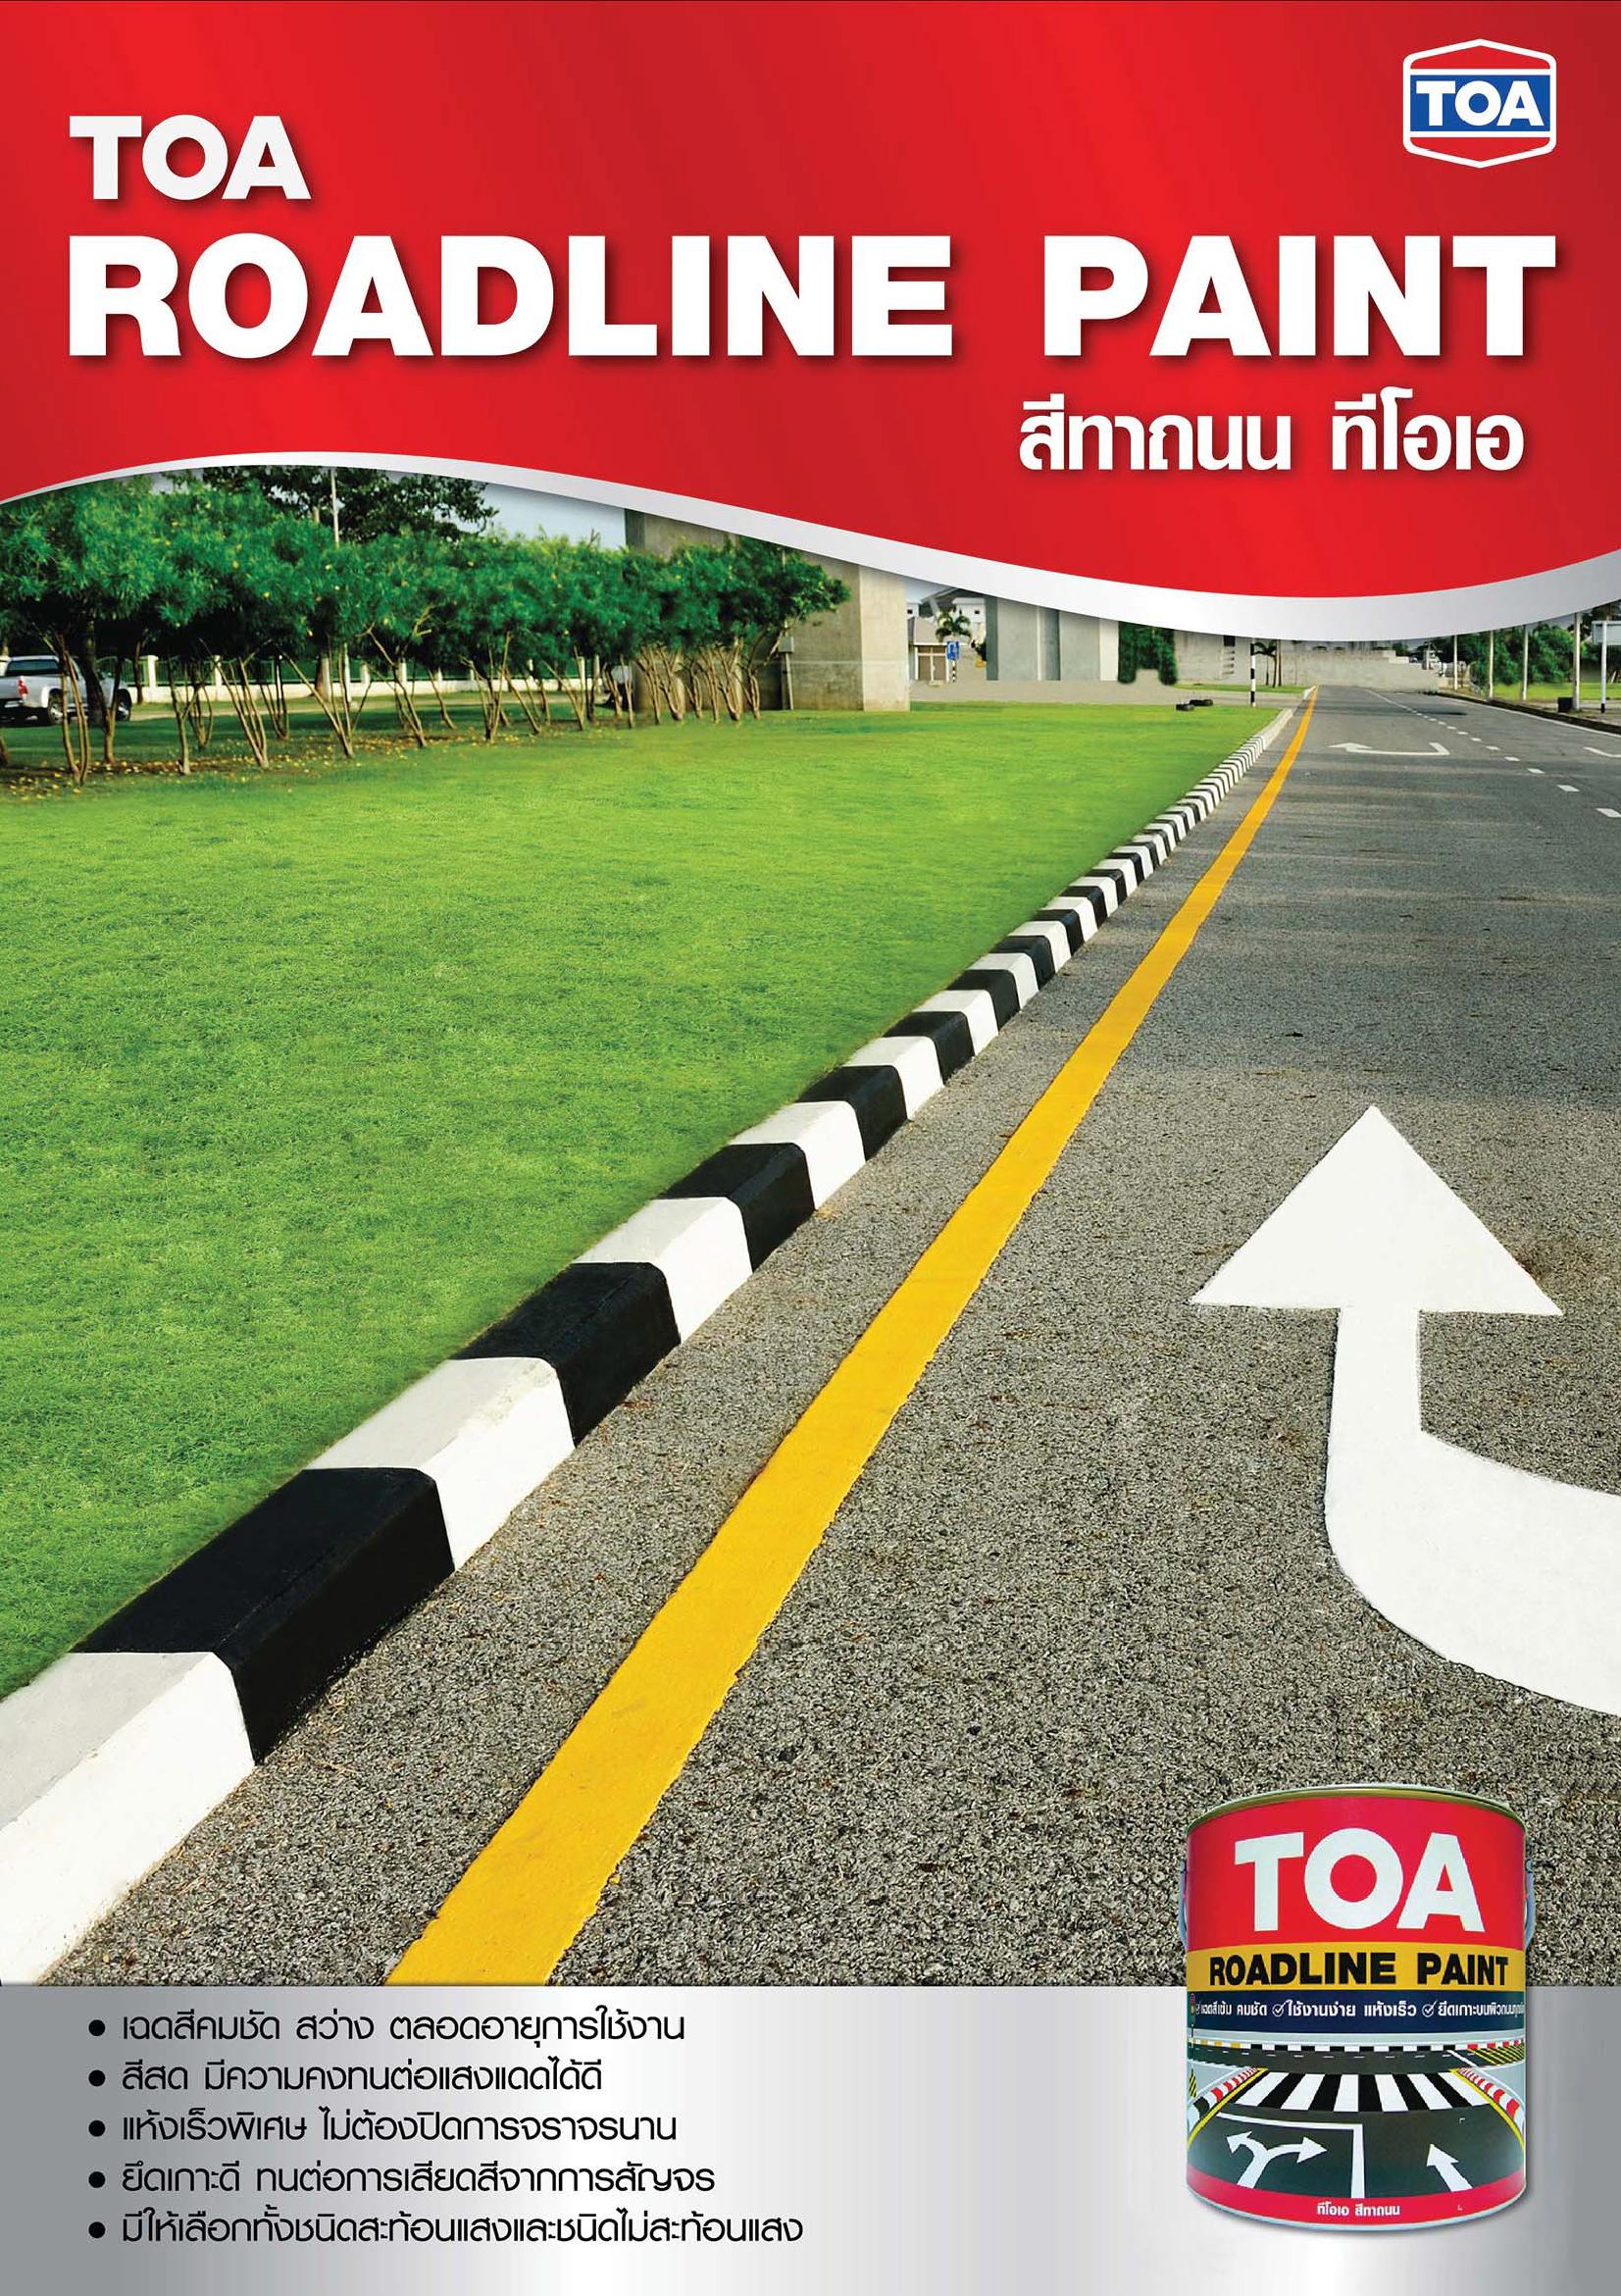 TOA Roadline Paint